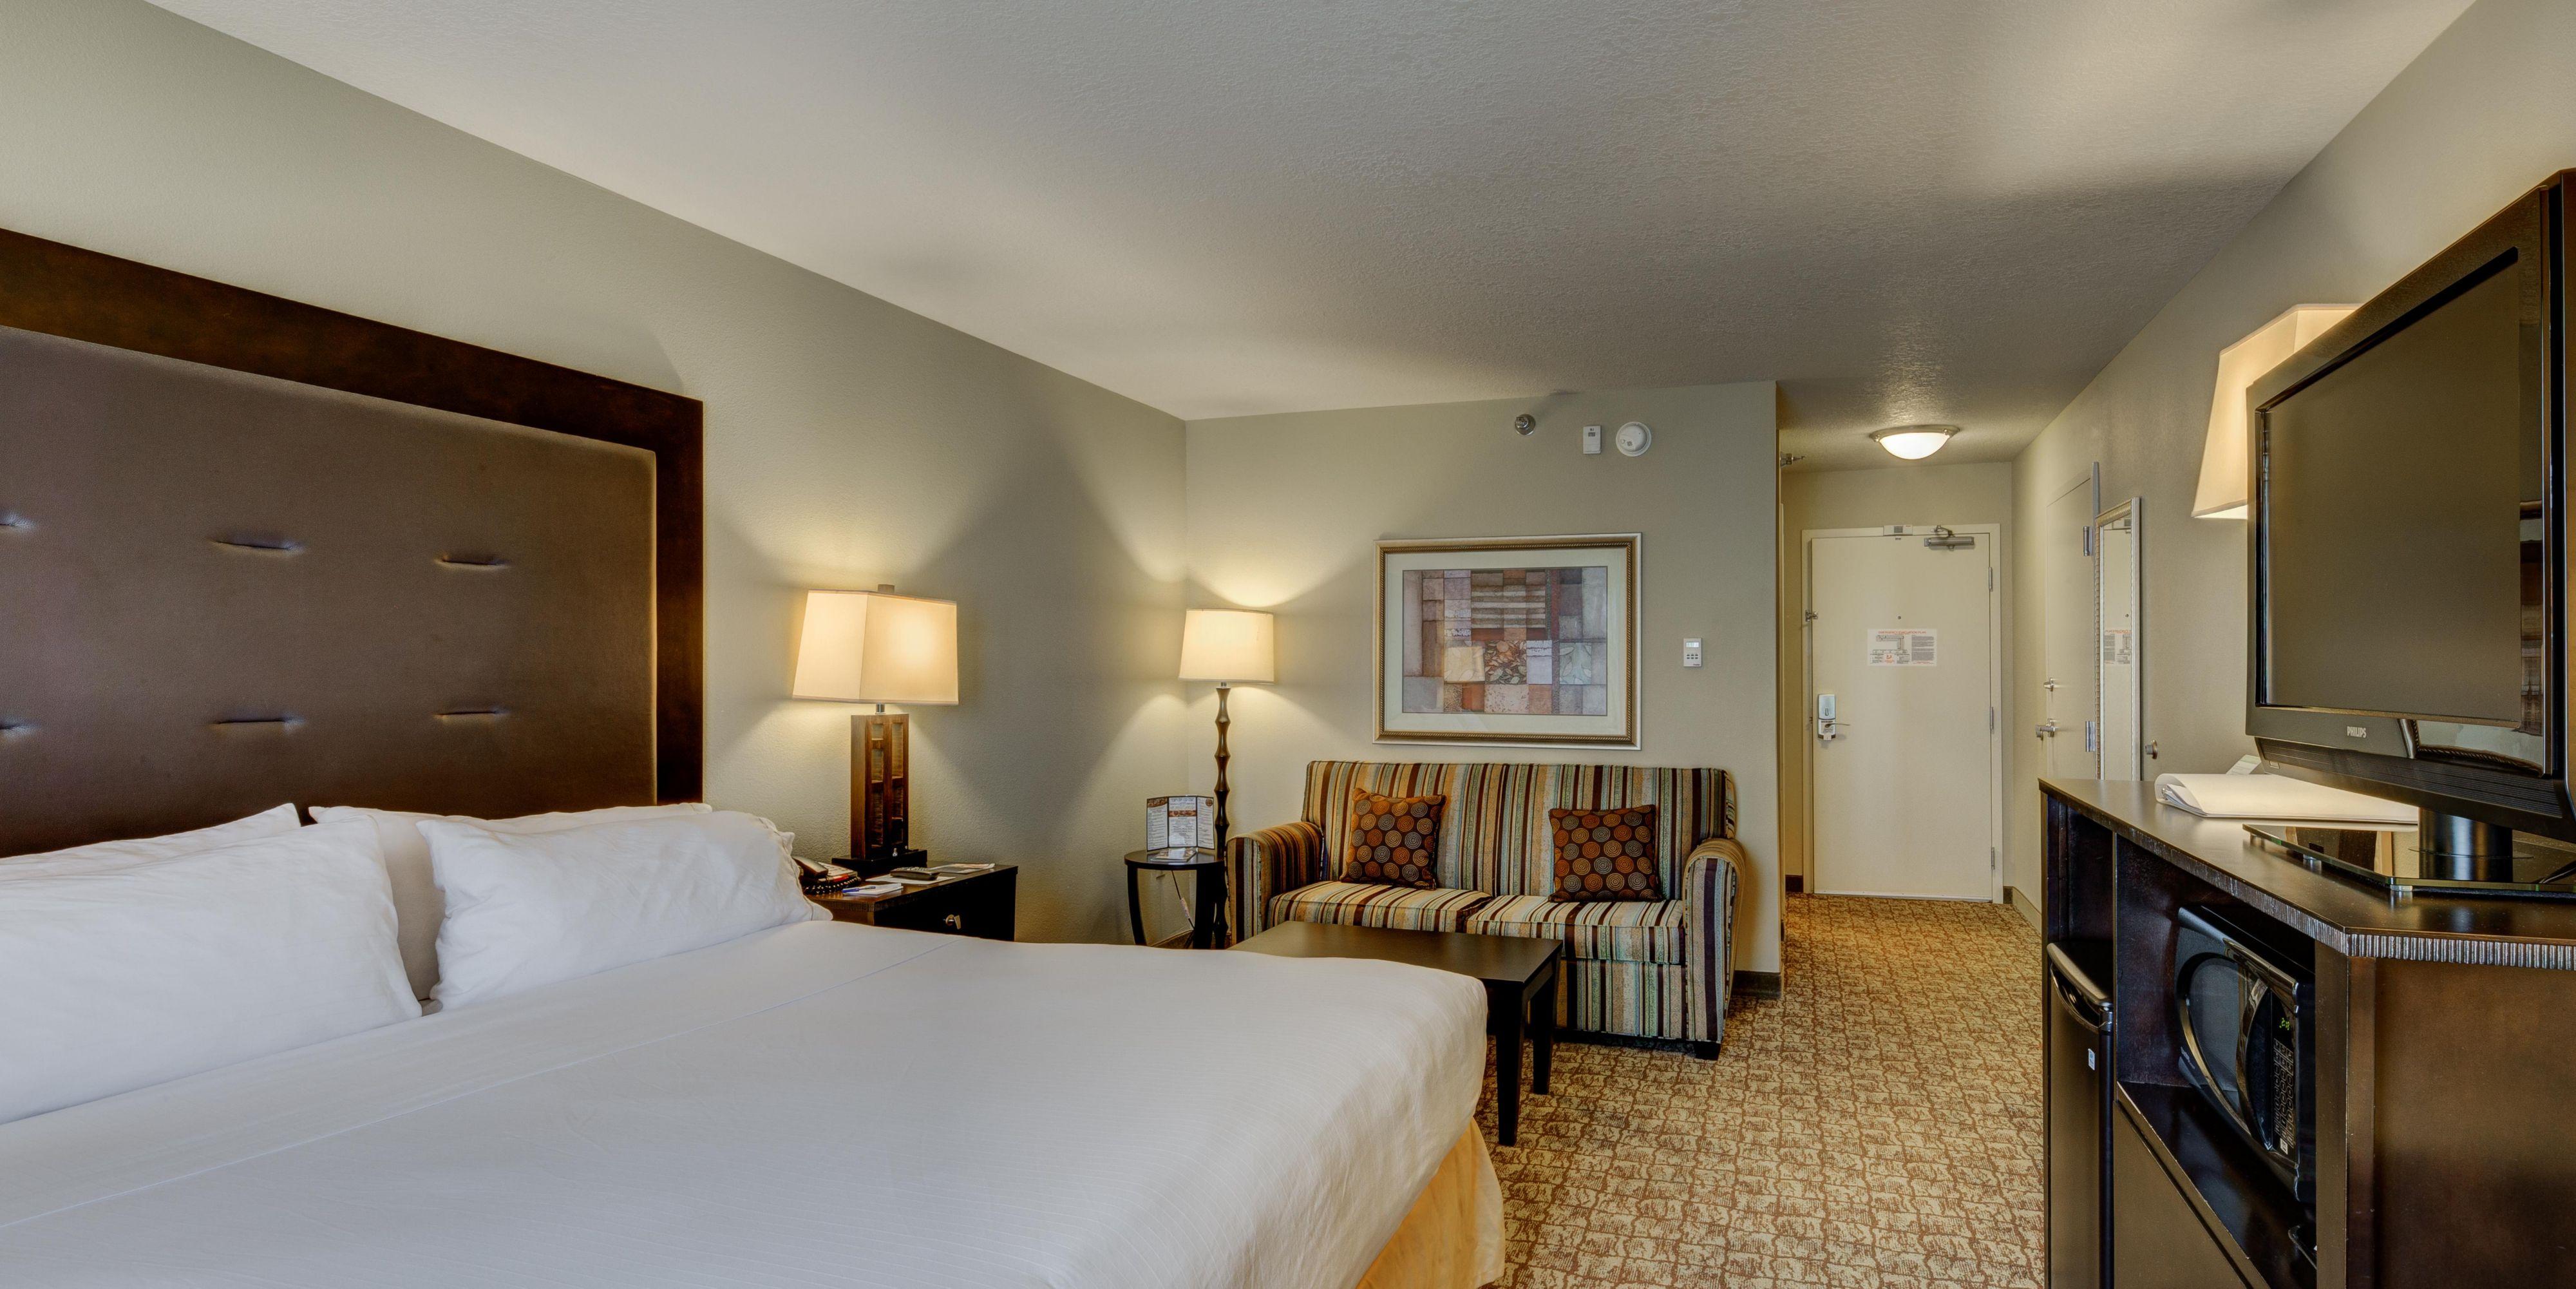 Holiday Inn Express Dublin 4232032987 2x1